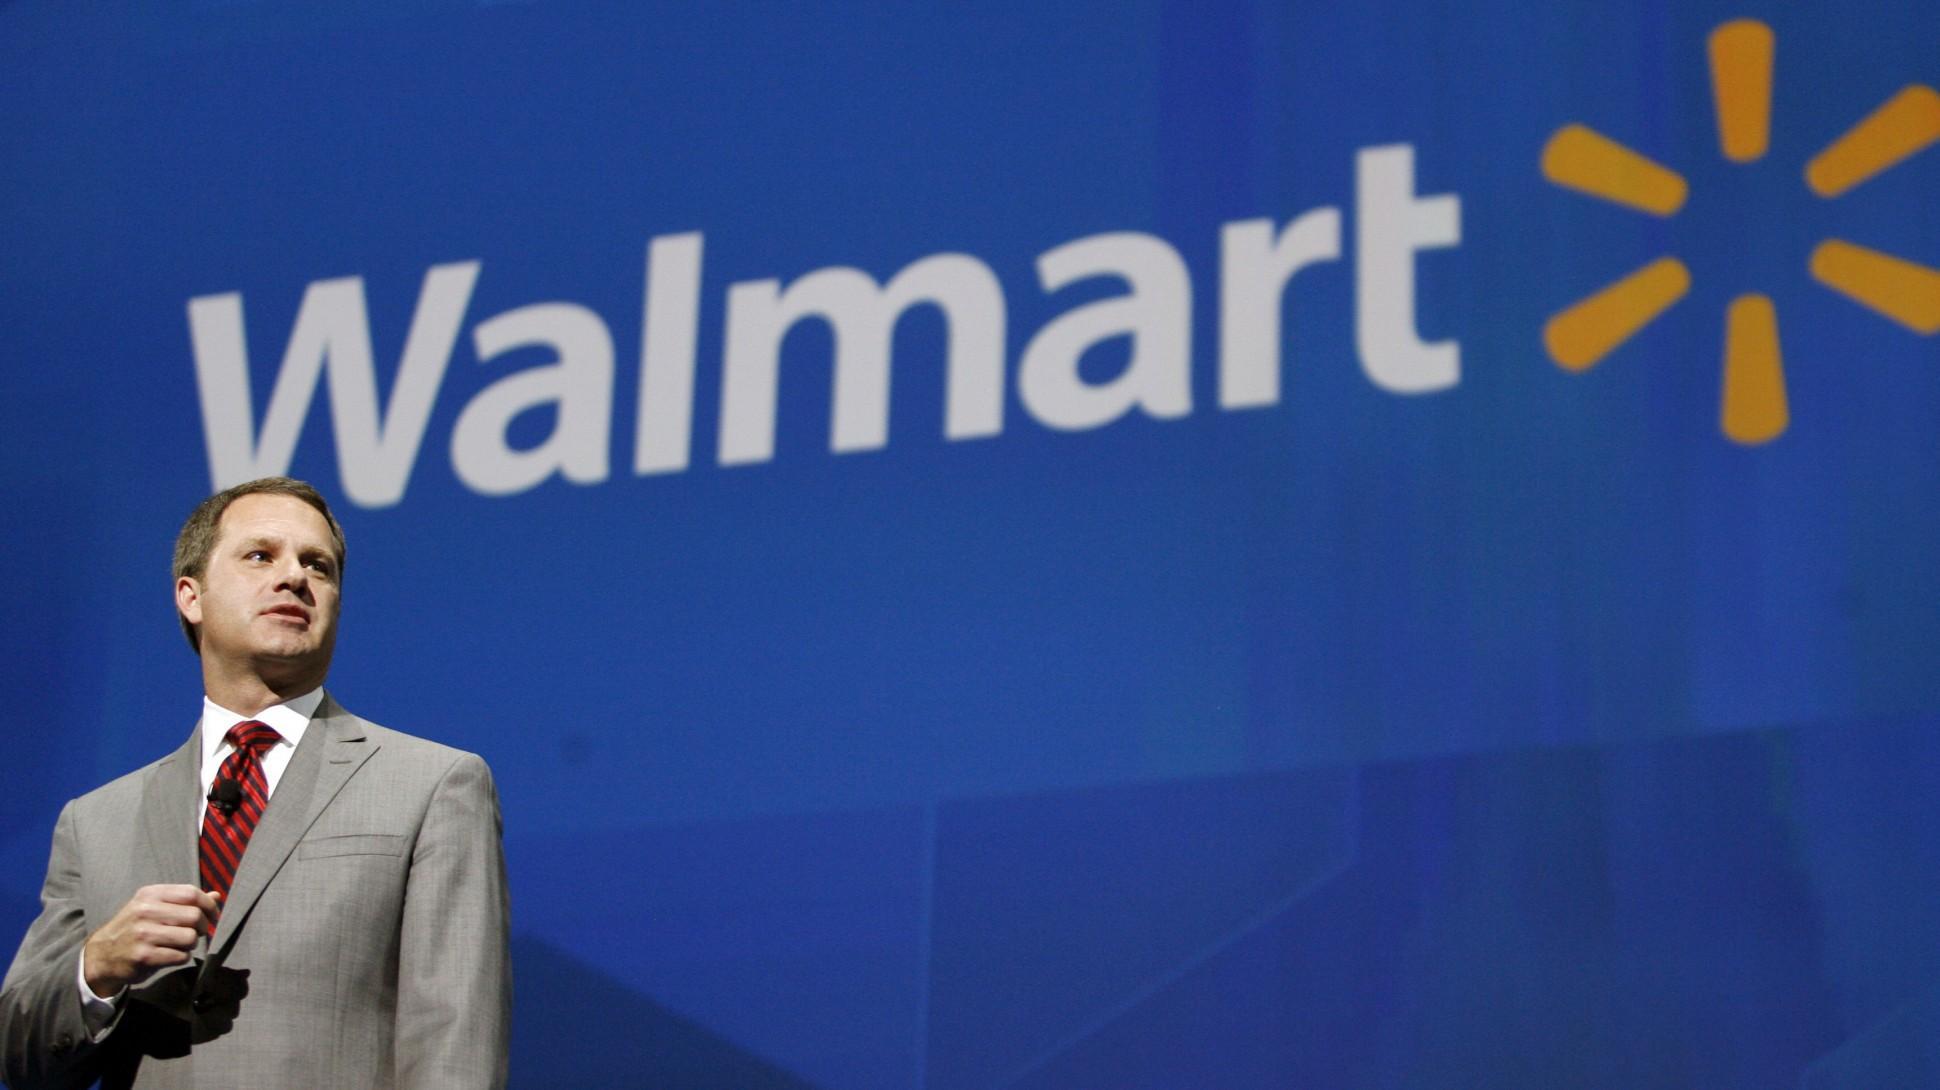 Google + Walmart peuvent-ils rivaliser avec Amazon?